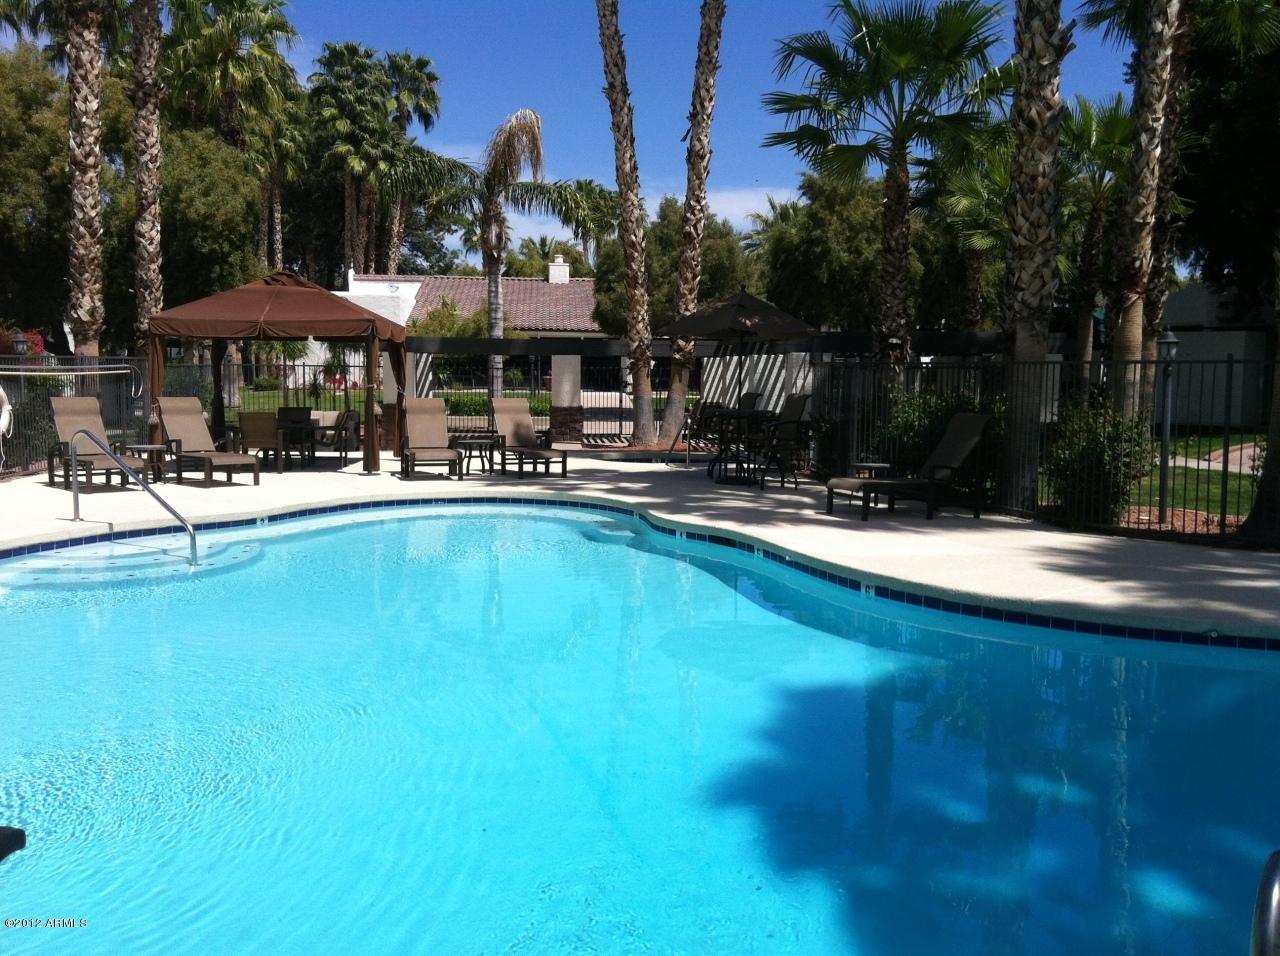 7350 N Via Paseo Del Sur  -- M103 Scottsdale AZ 85258